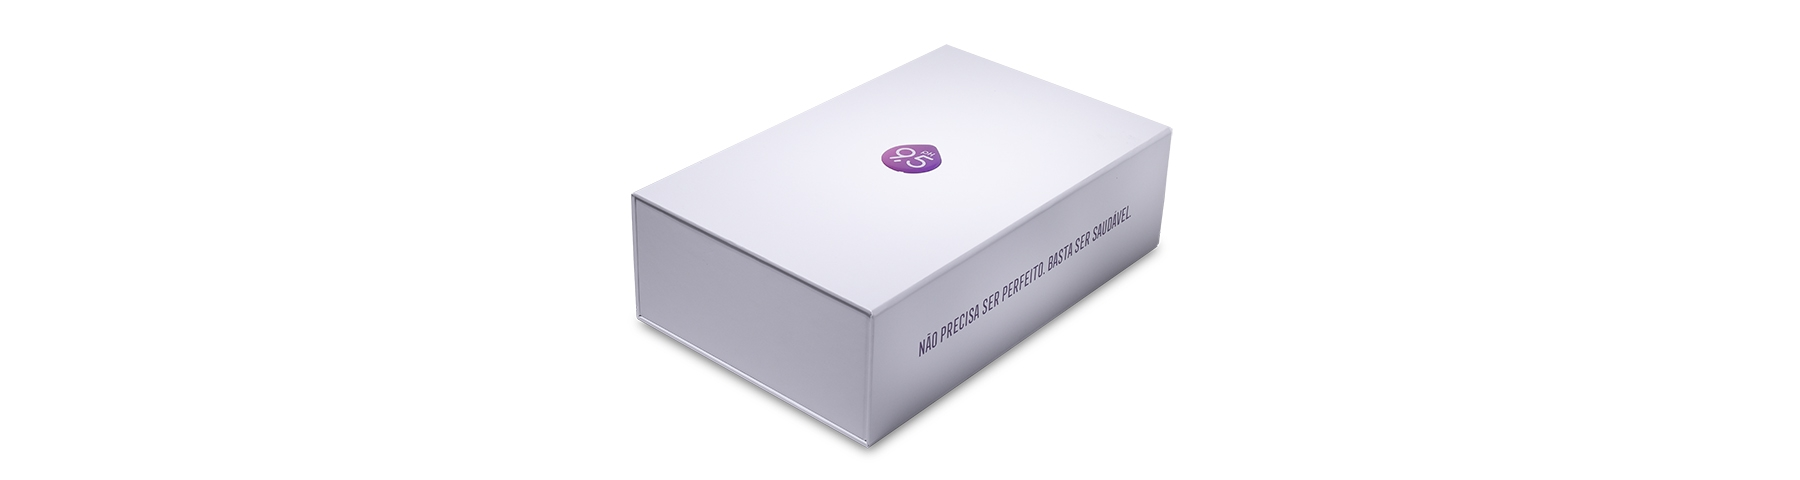 Gift Box Monchique